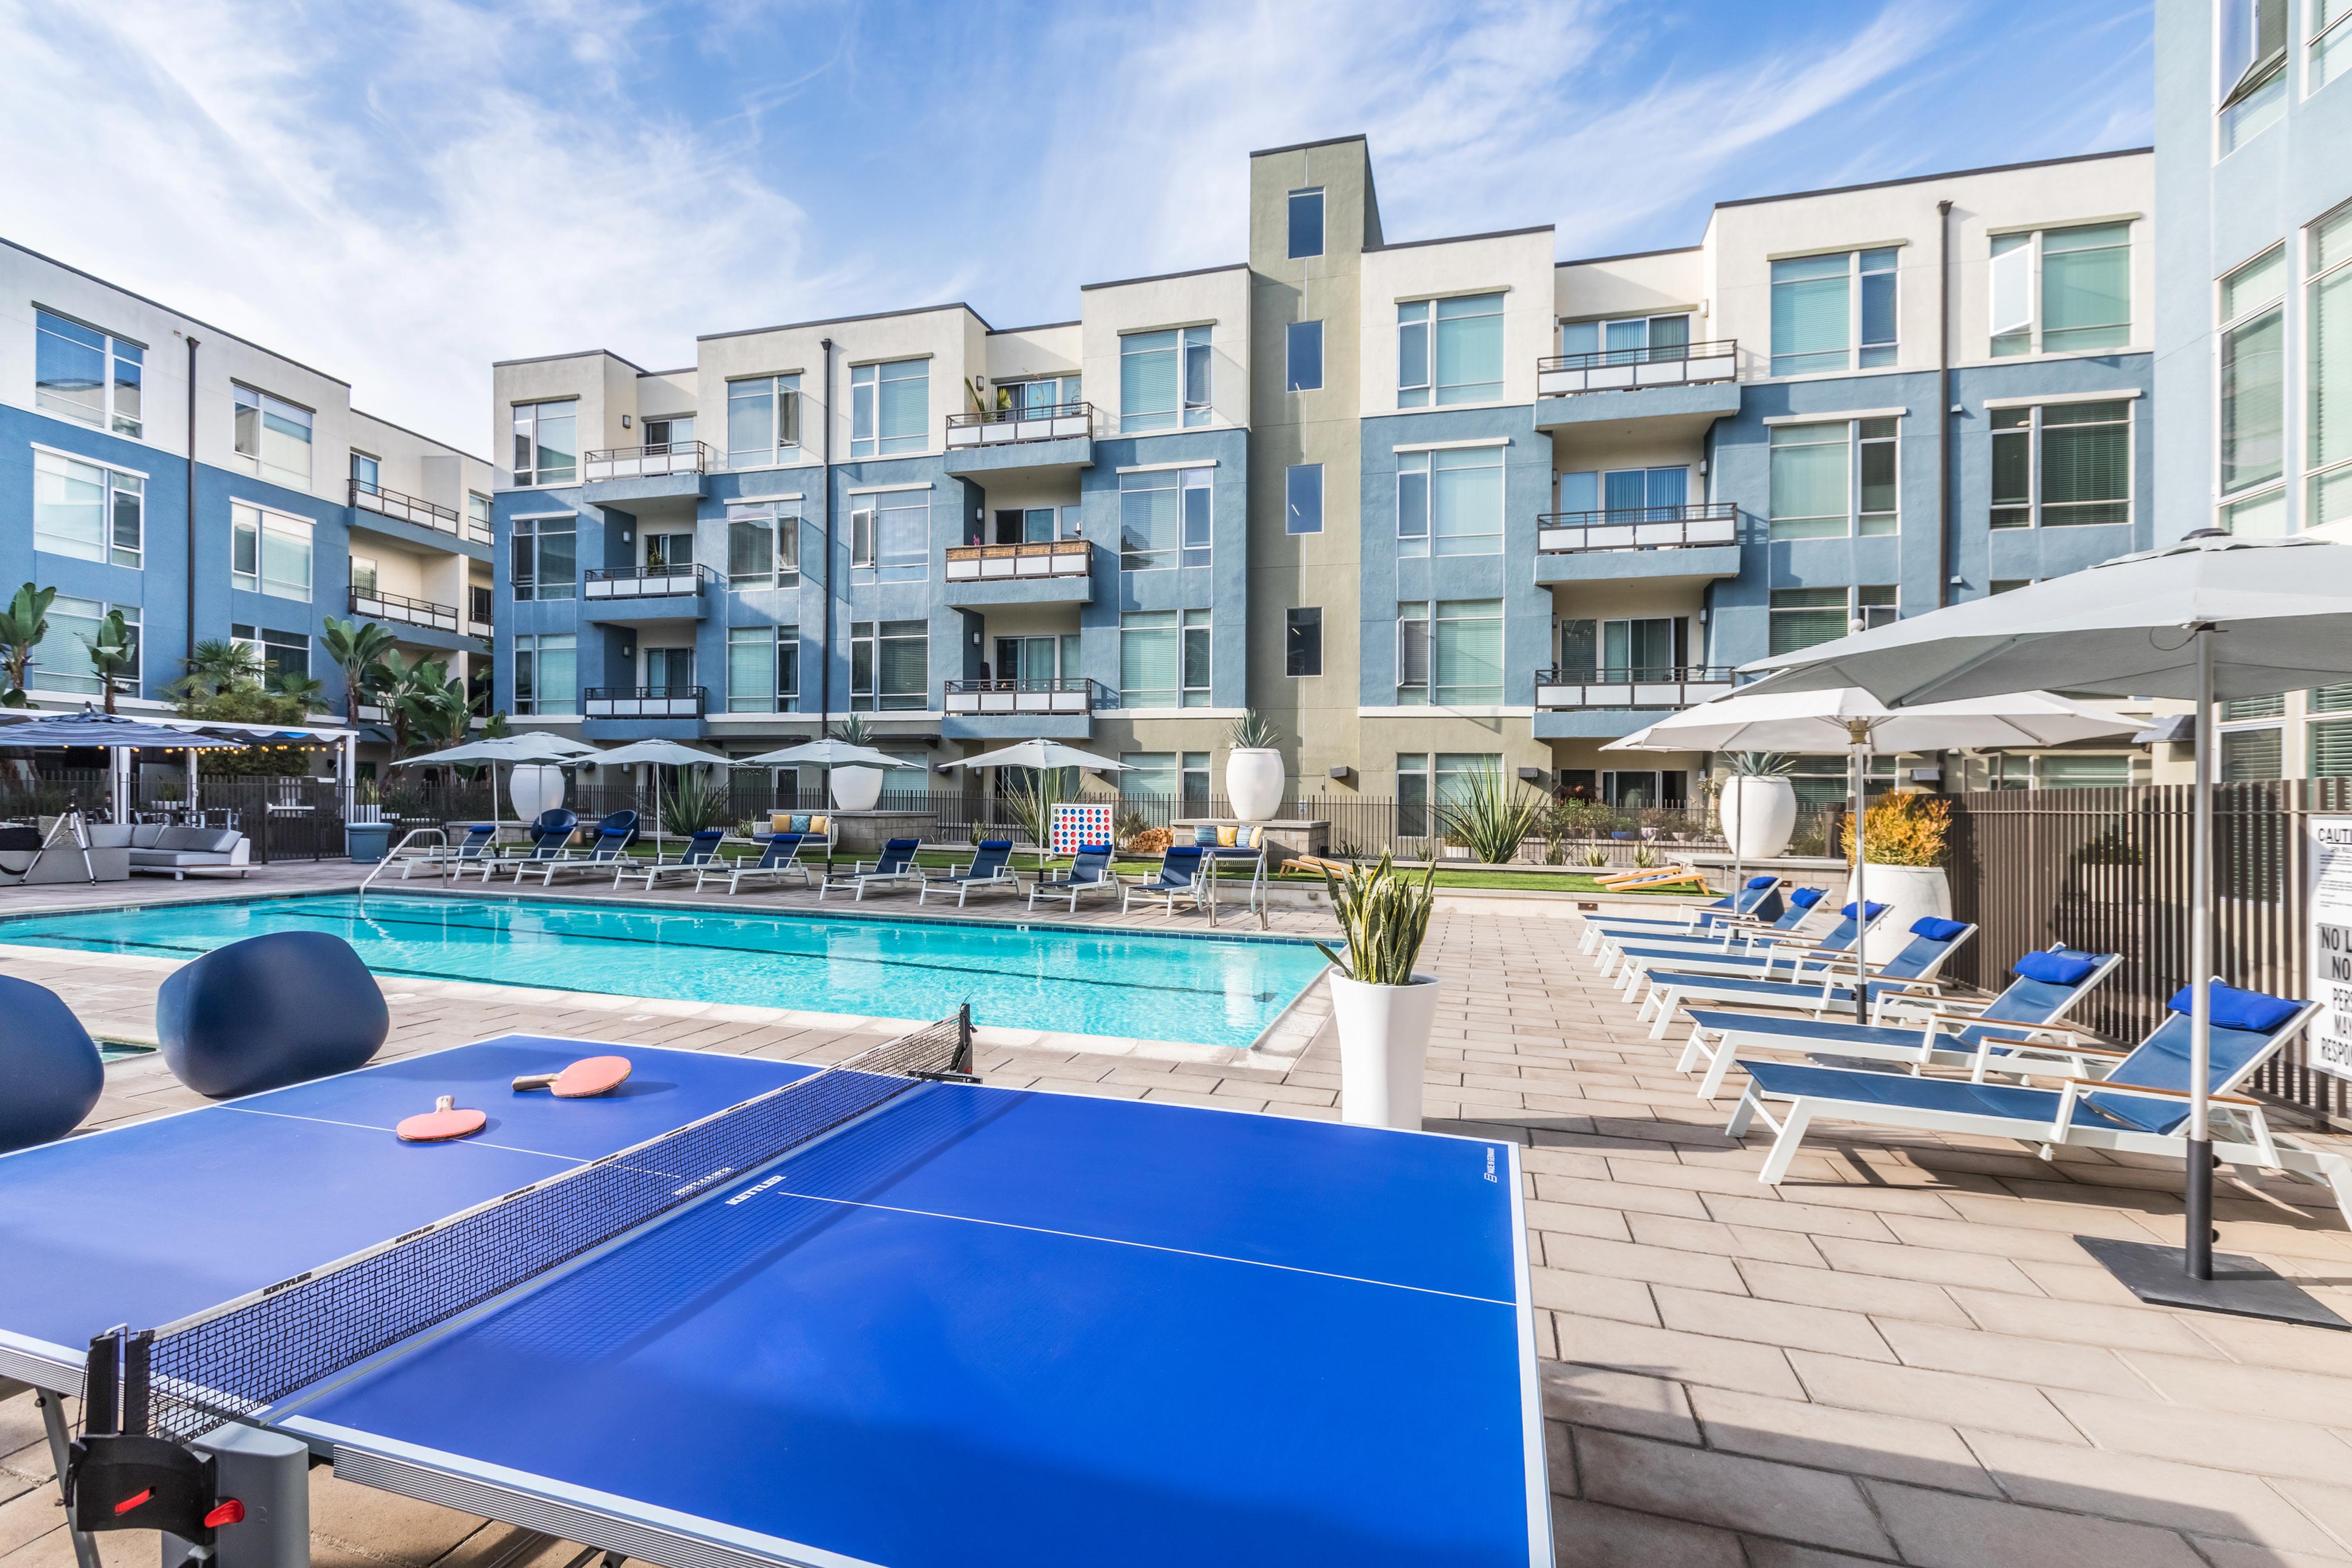 Westminster Ca Apartments Craigslist